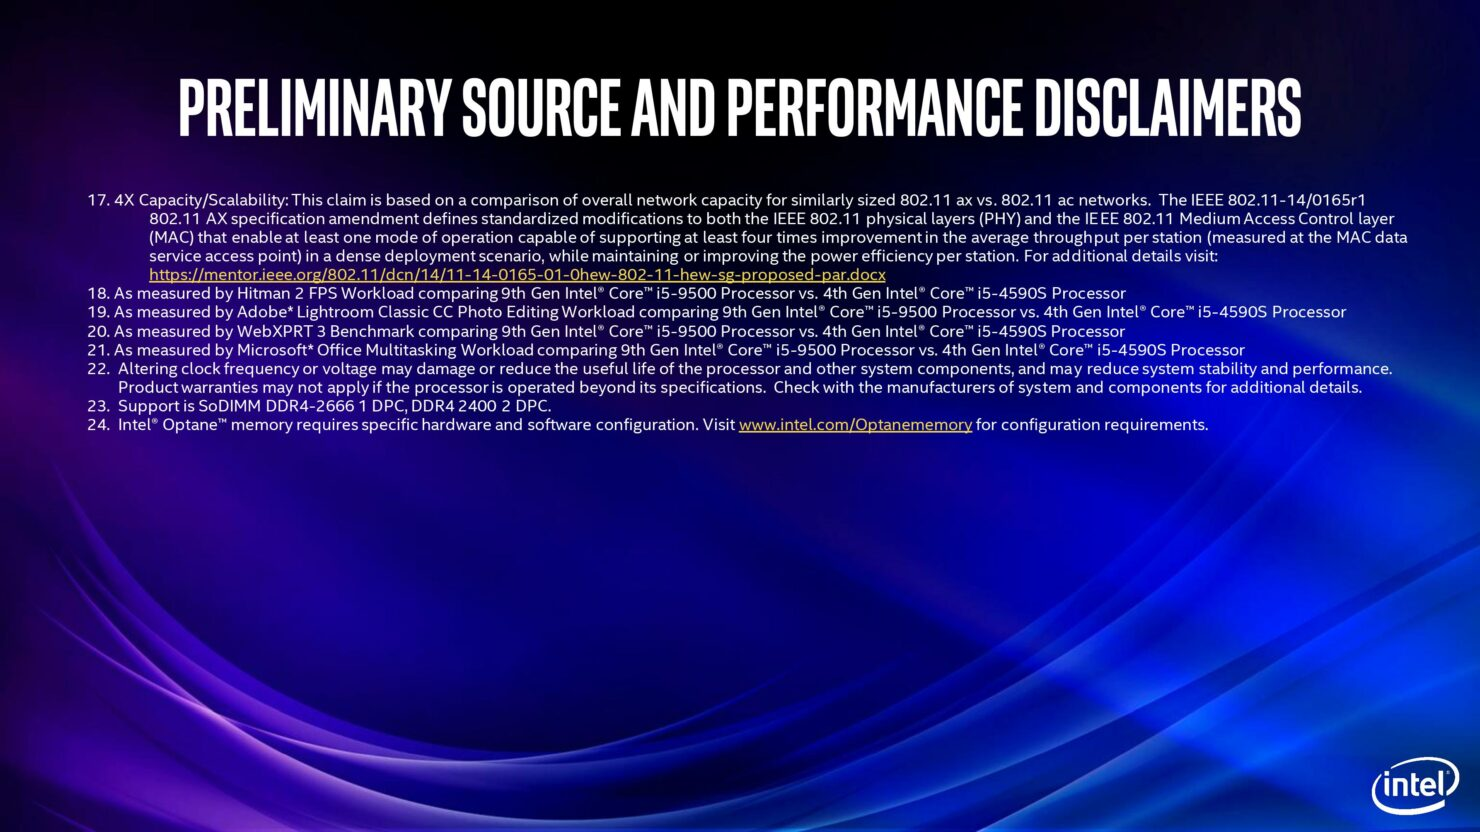 9th-gen-intel-core-mobile-launch-presentation-under-nda-until-april-23-page-029